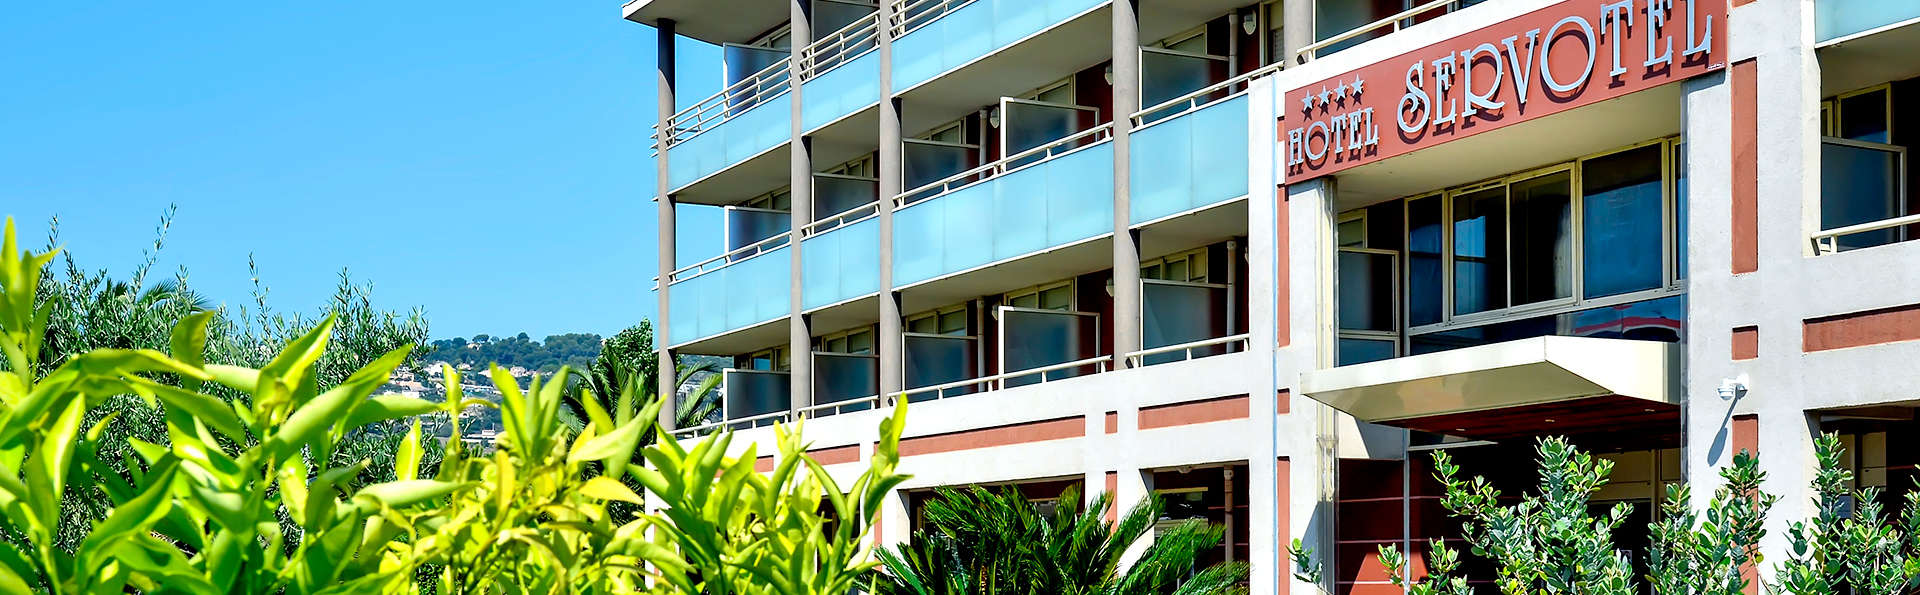 H tel servotel h tel de charme nice for Reservation hotel paca